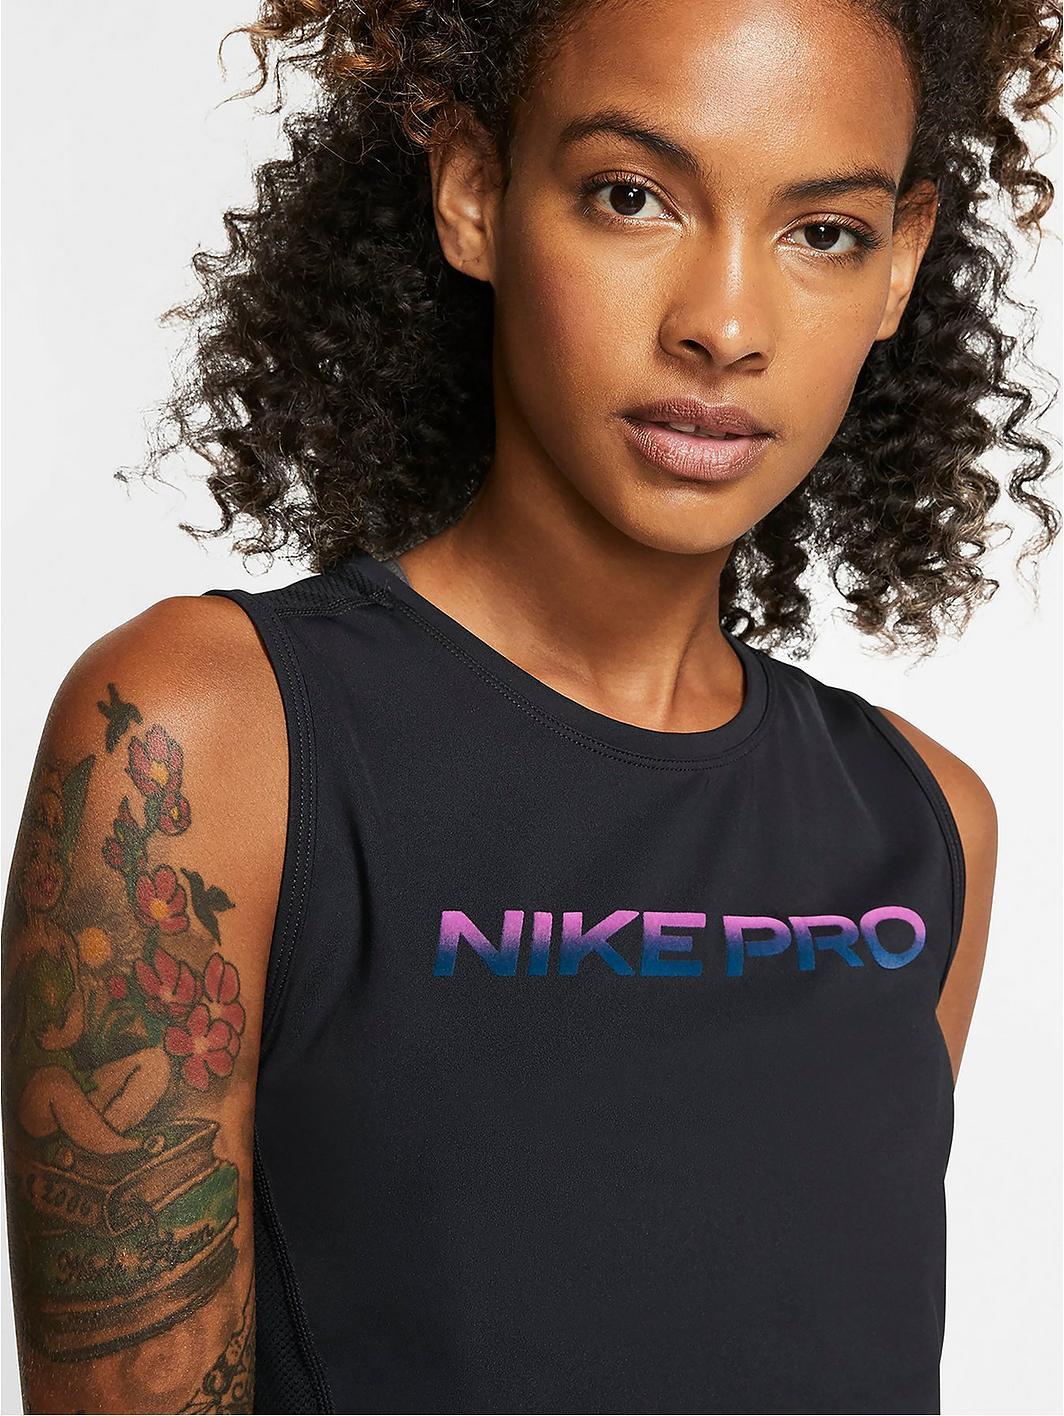 Nike Pro Training Crop Tank Top - Black kc45Xz